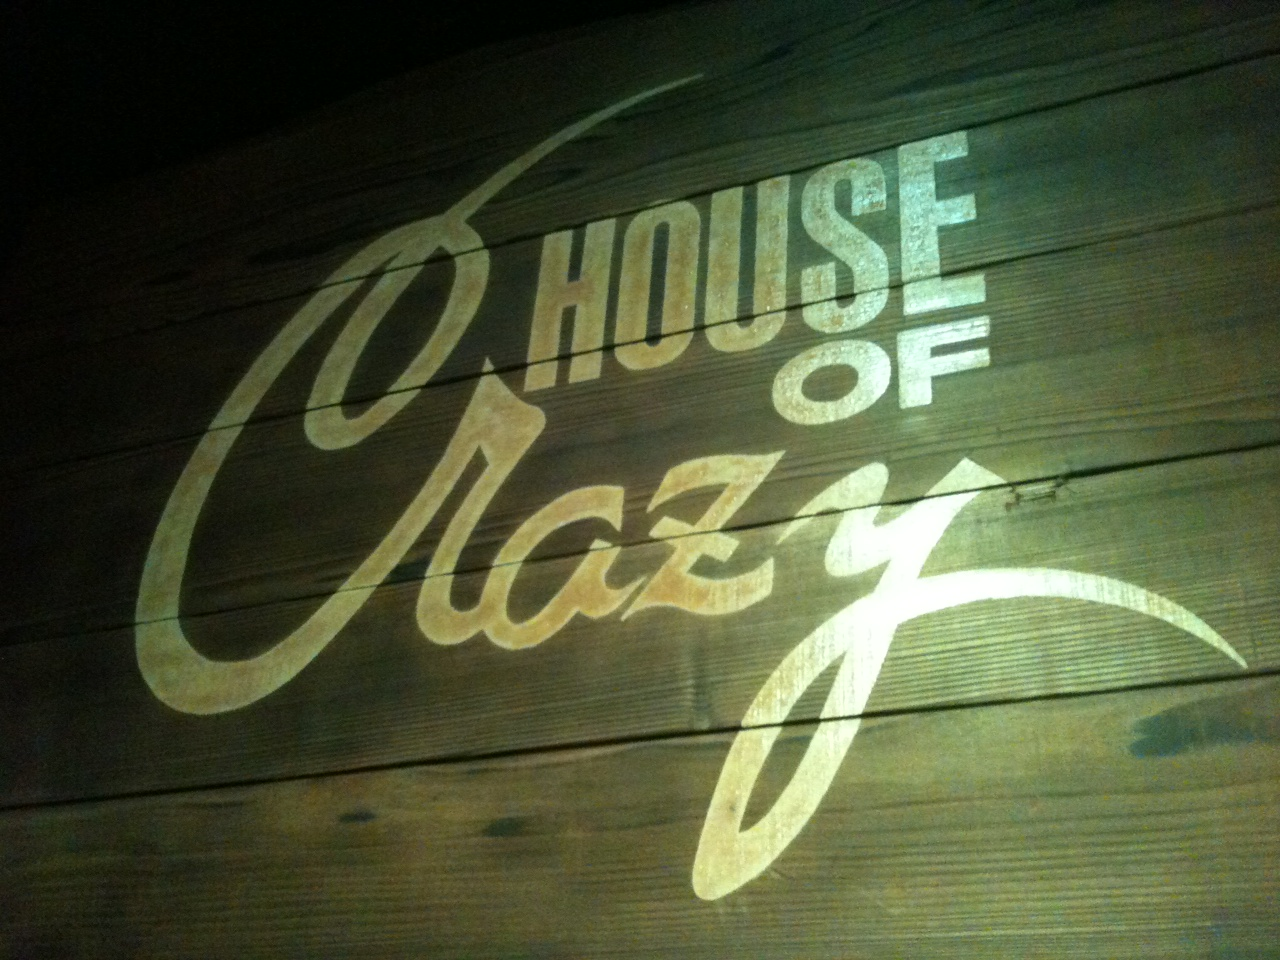 HOUSE of Crazy_c0227168_15412420.jpg